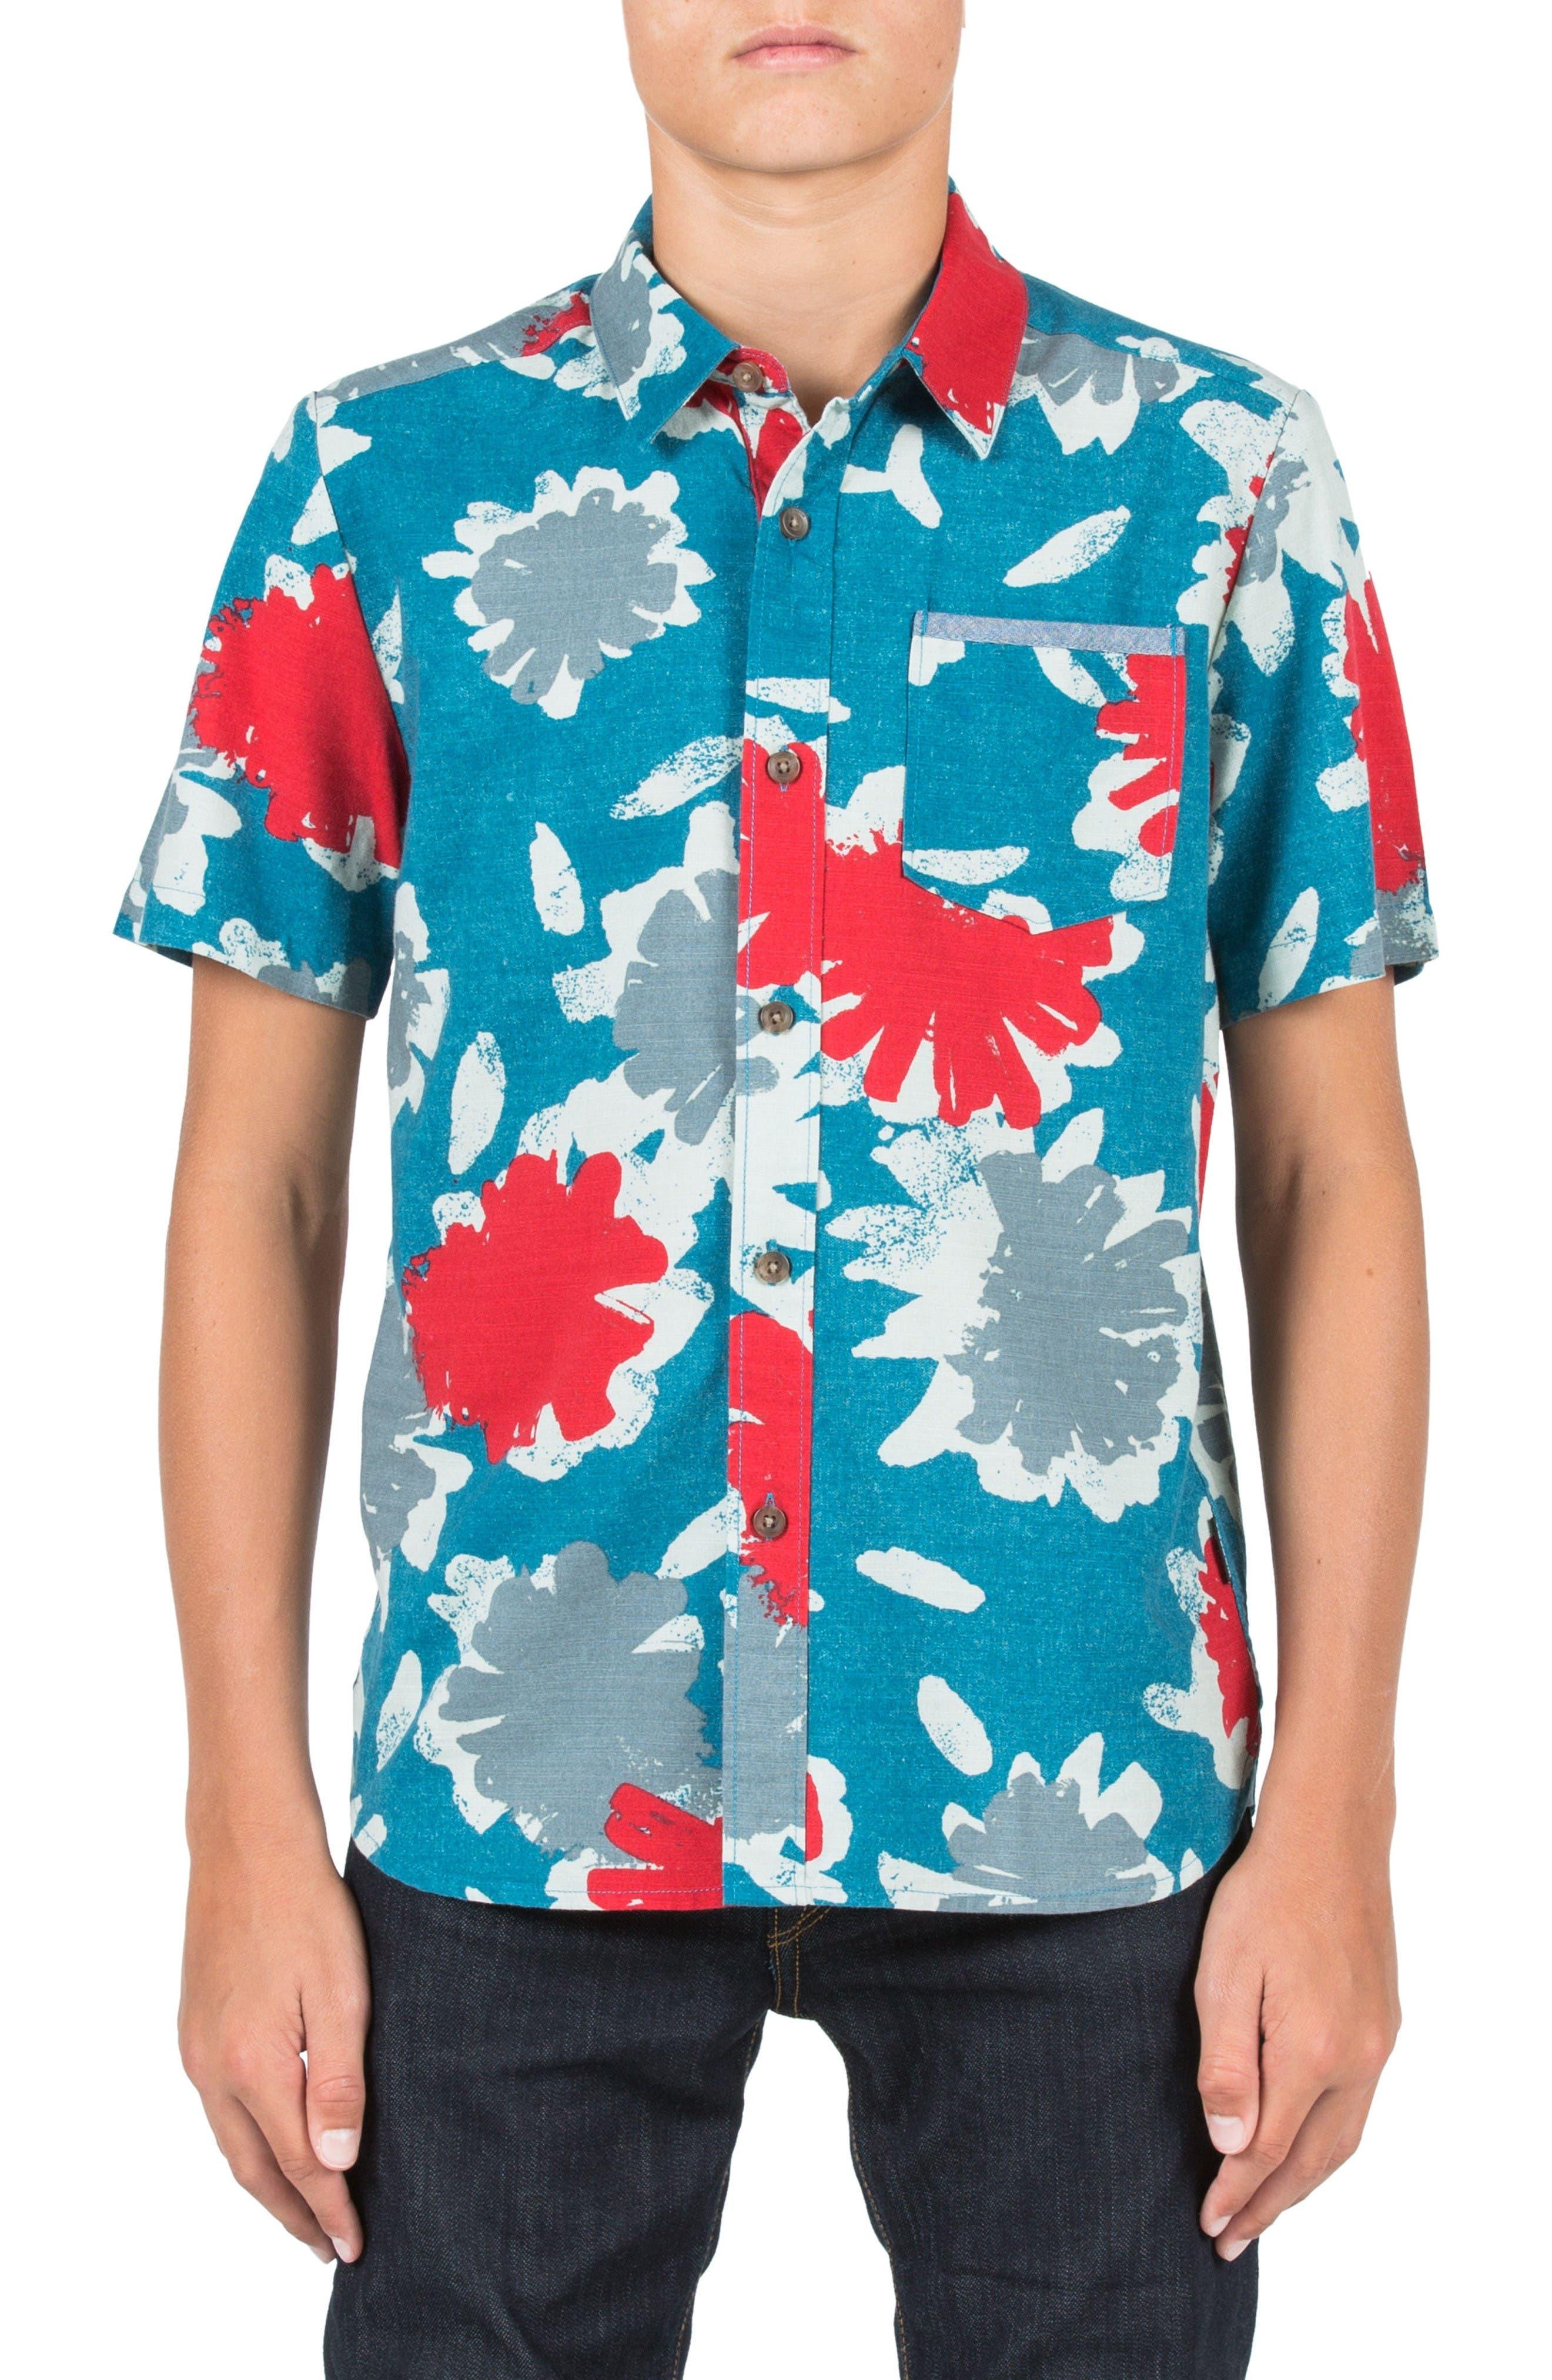 VOLCOM Ballast Short Sleeve Woven Shirt